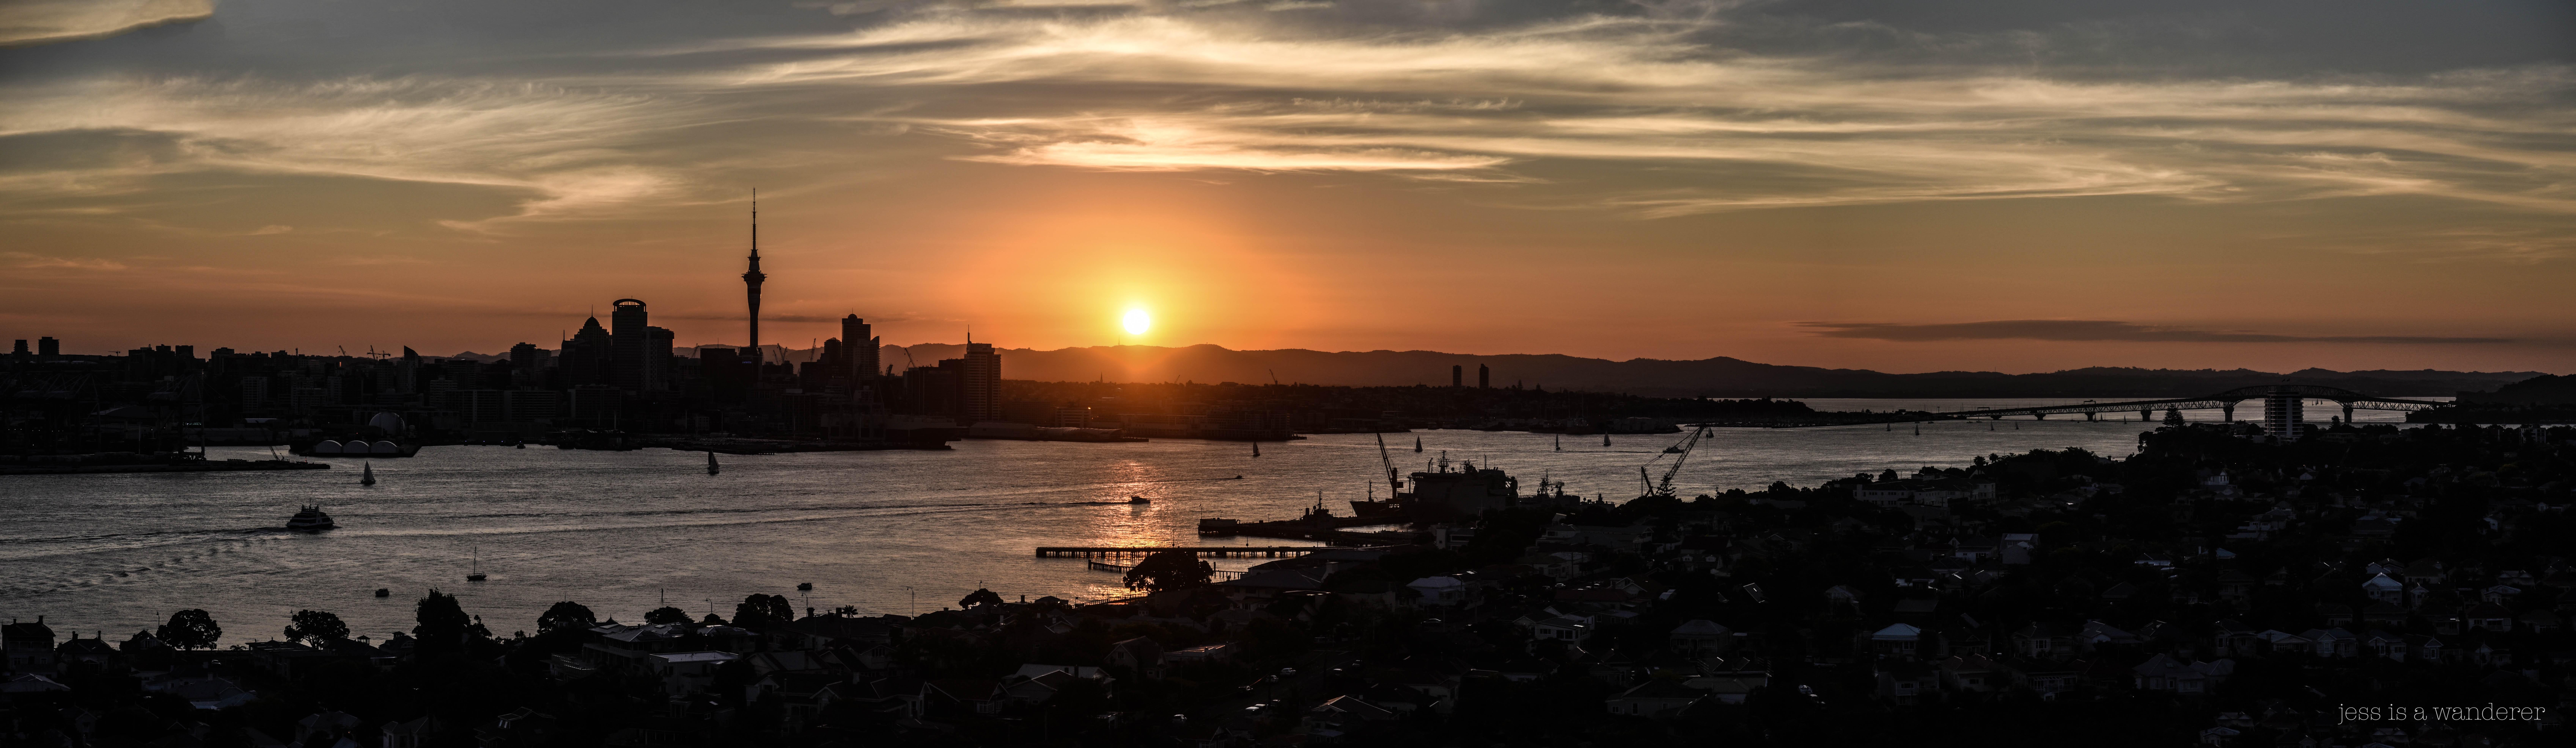 Sun setting over the city